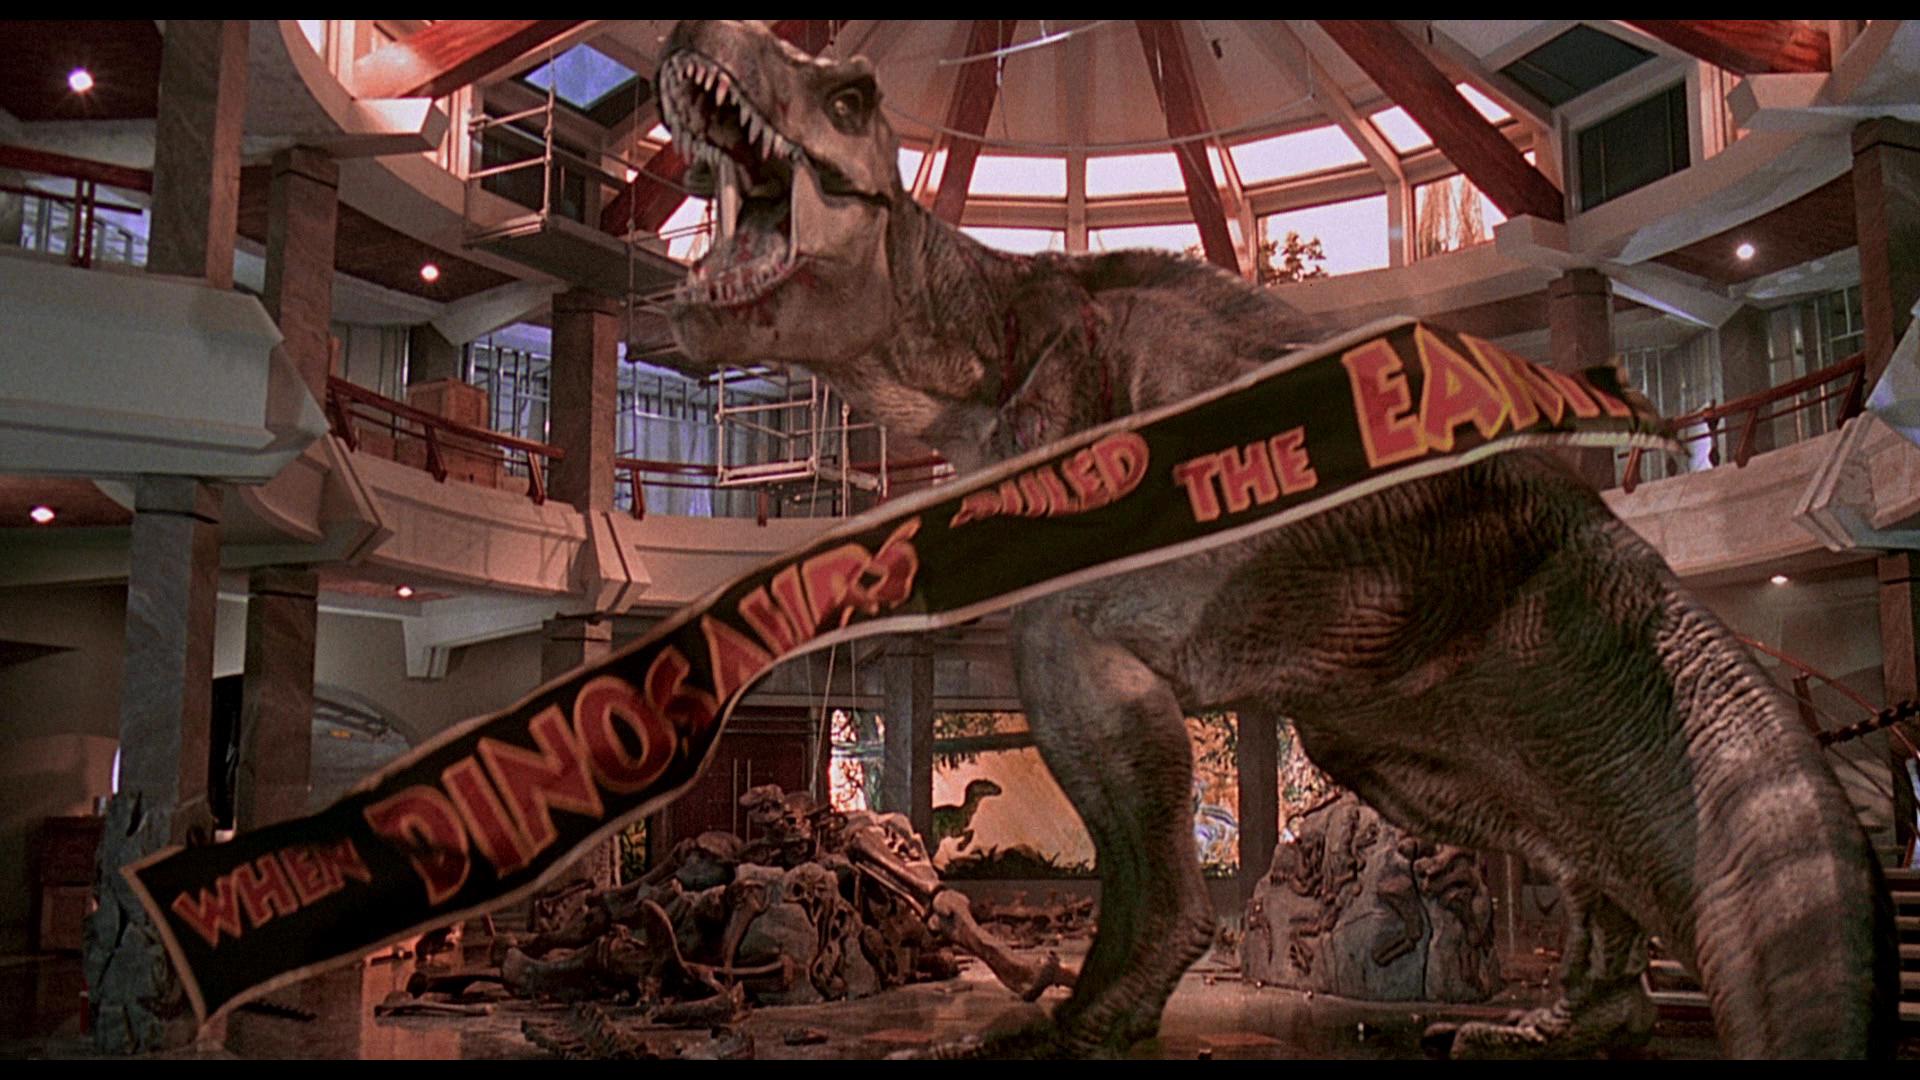 Jurassic Park Hd Wallpaper Background Image 1920x1080 Id